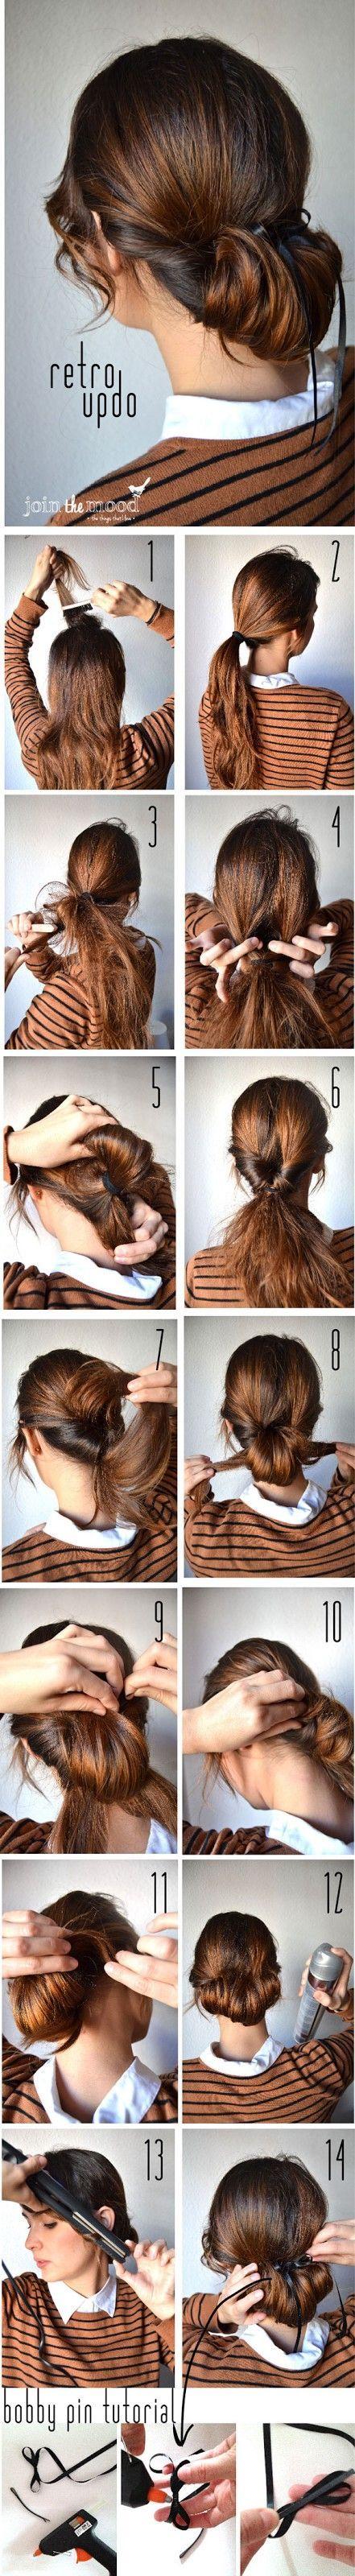 trendy low bun updo hairstyles tutorials easy cute retro updo